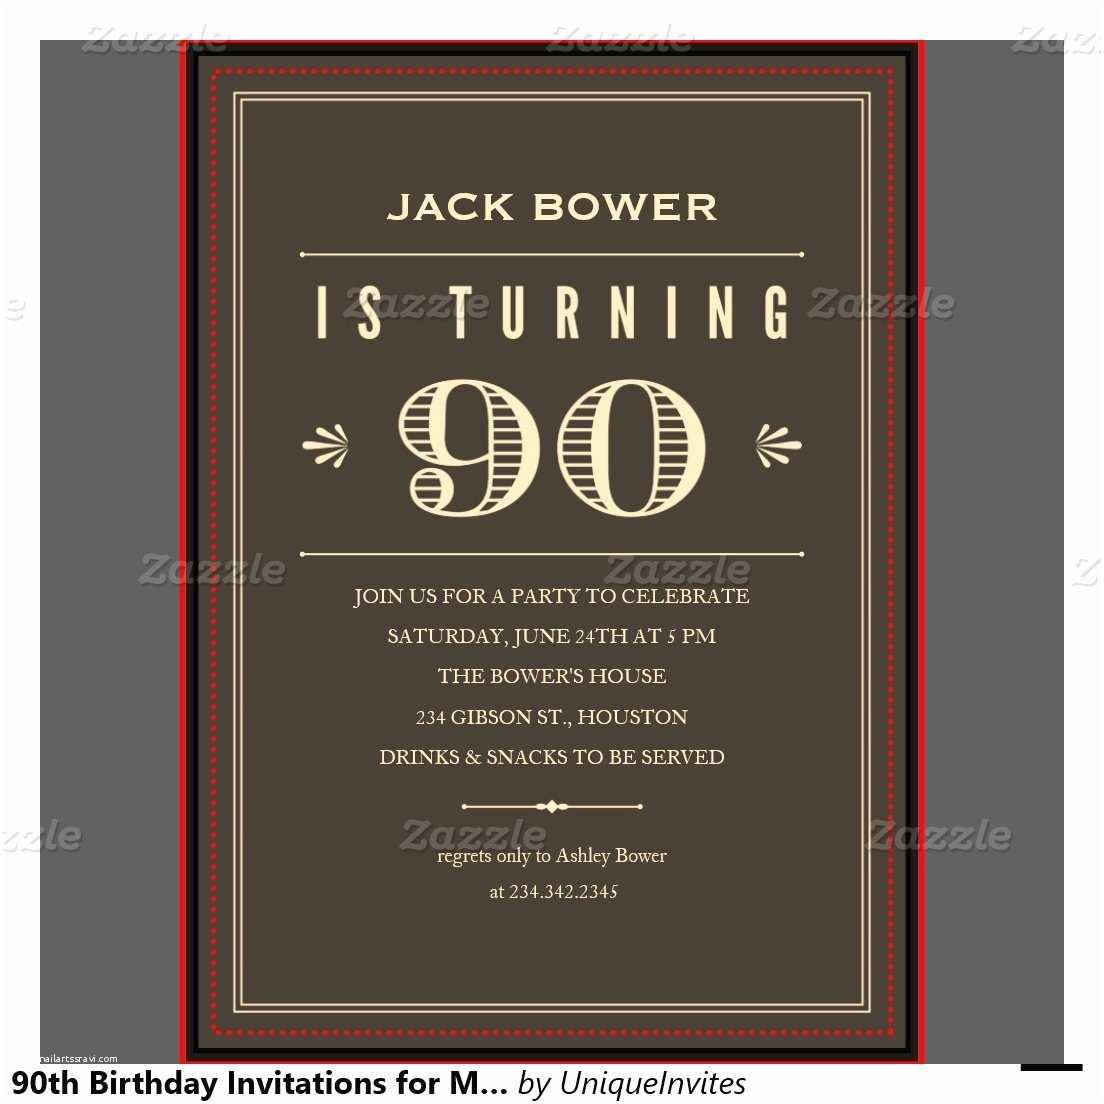 90th Birthday Invitations Free Printable 90th Birthday Invitations